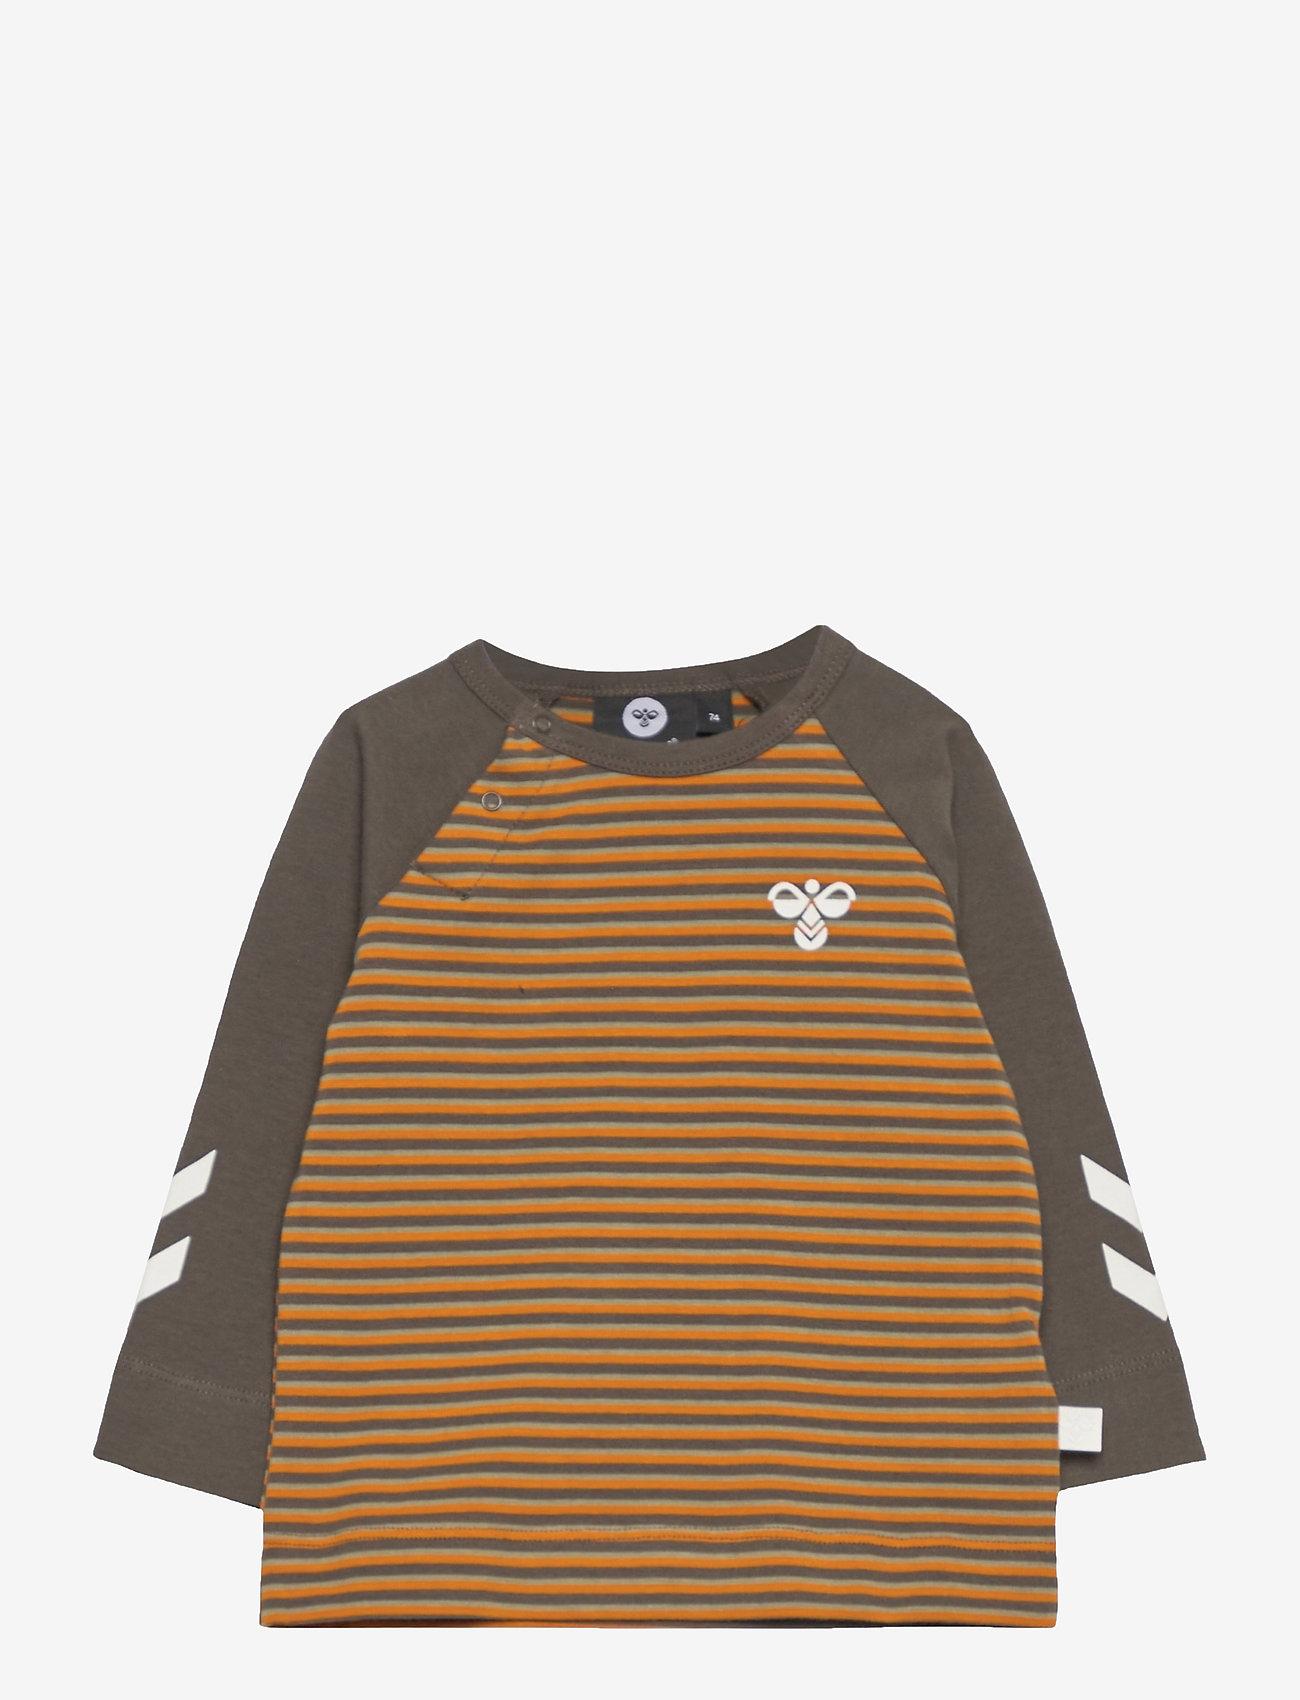 Hummel - hmlSTANTON T-SHIRT L/S - long-sleeved t-shirts - black olive - 0